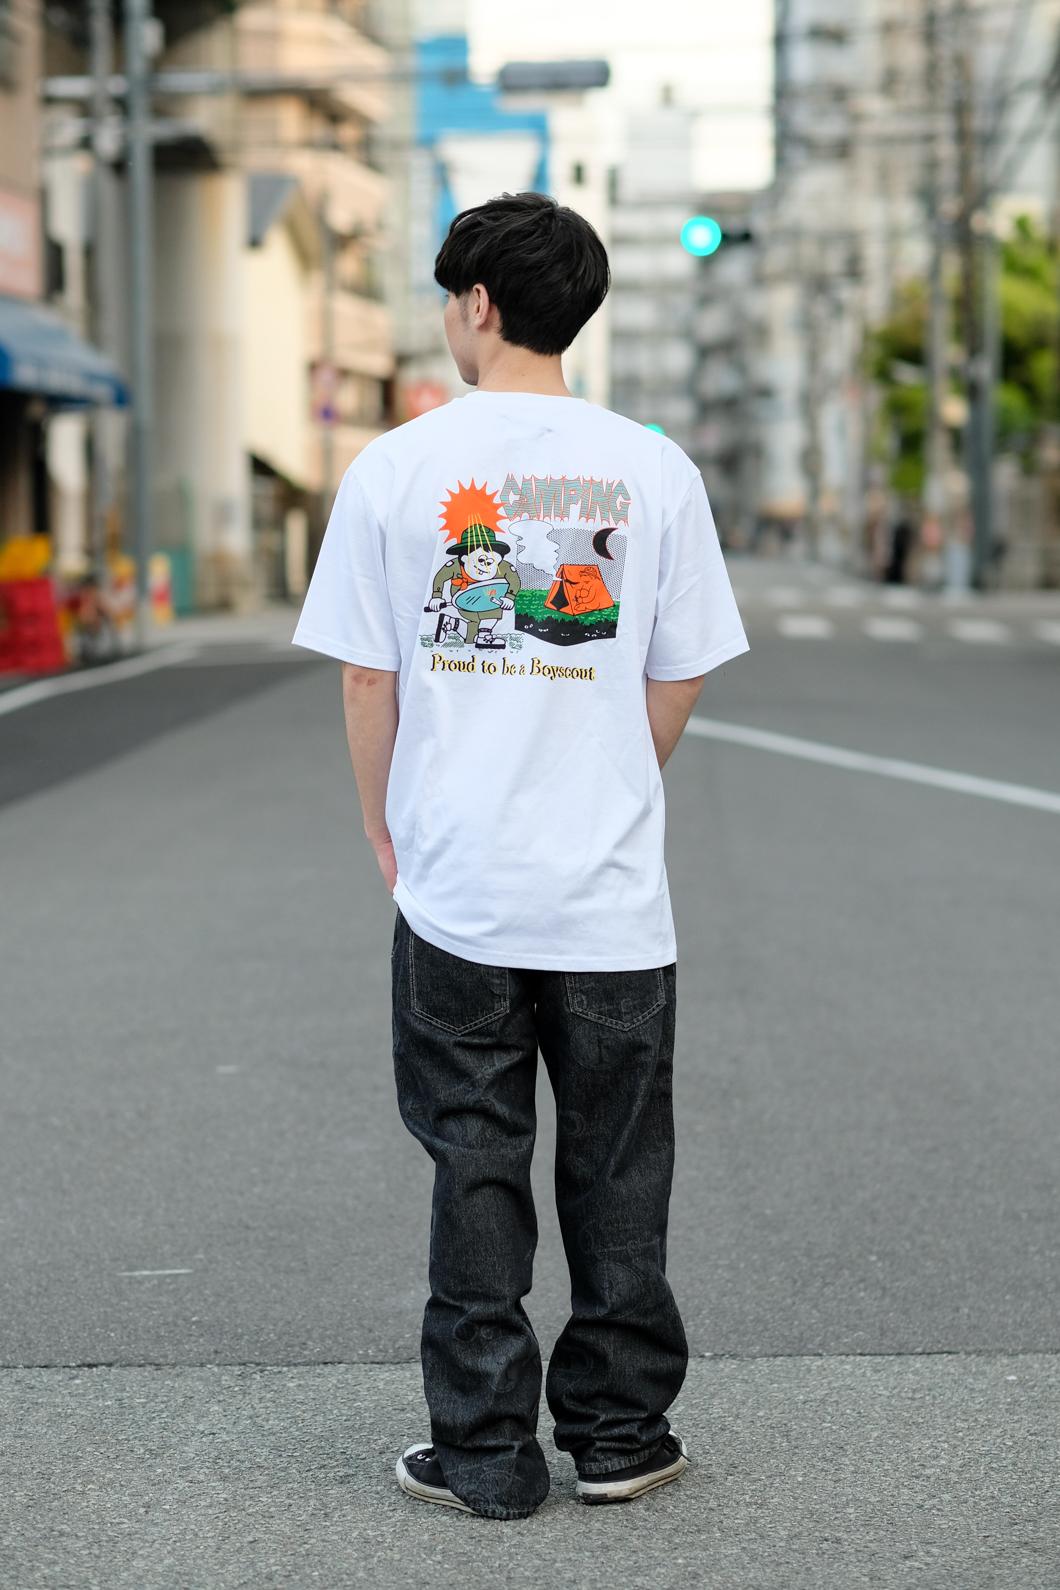 【PAS DE MER/パドゥメ】CAMPING T-SHIRT Tシャツ / WHITE